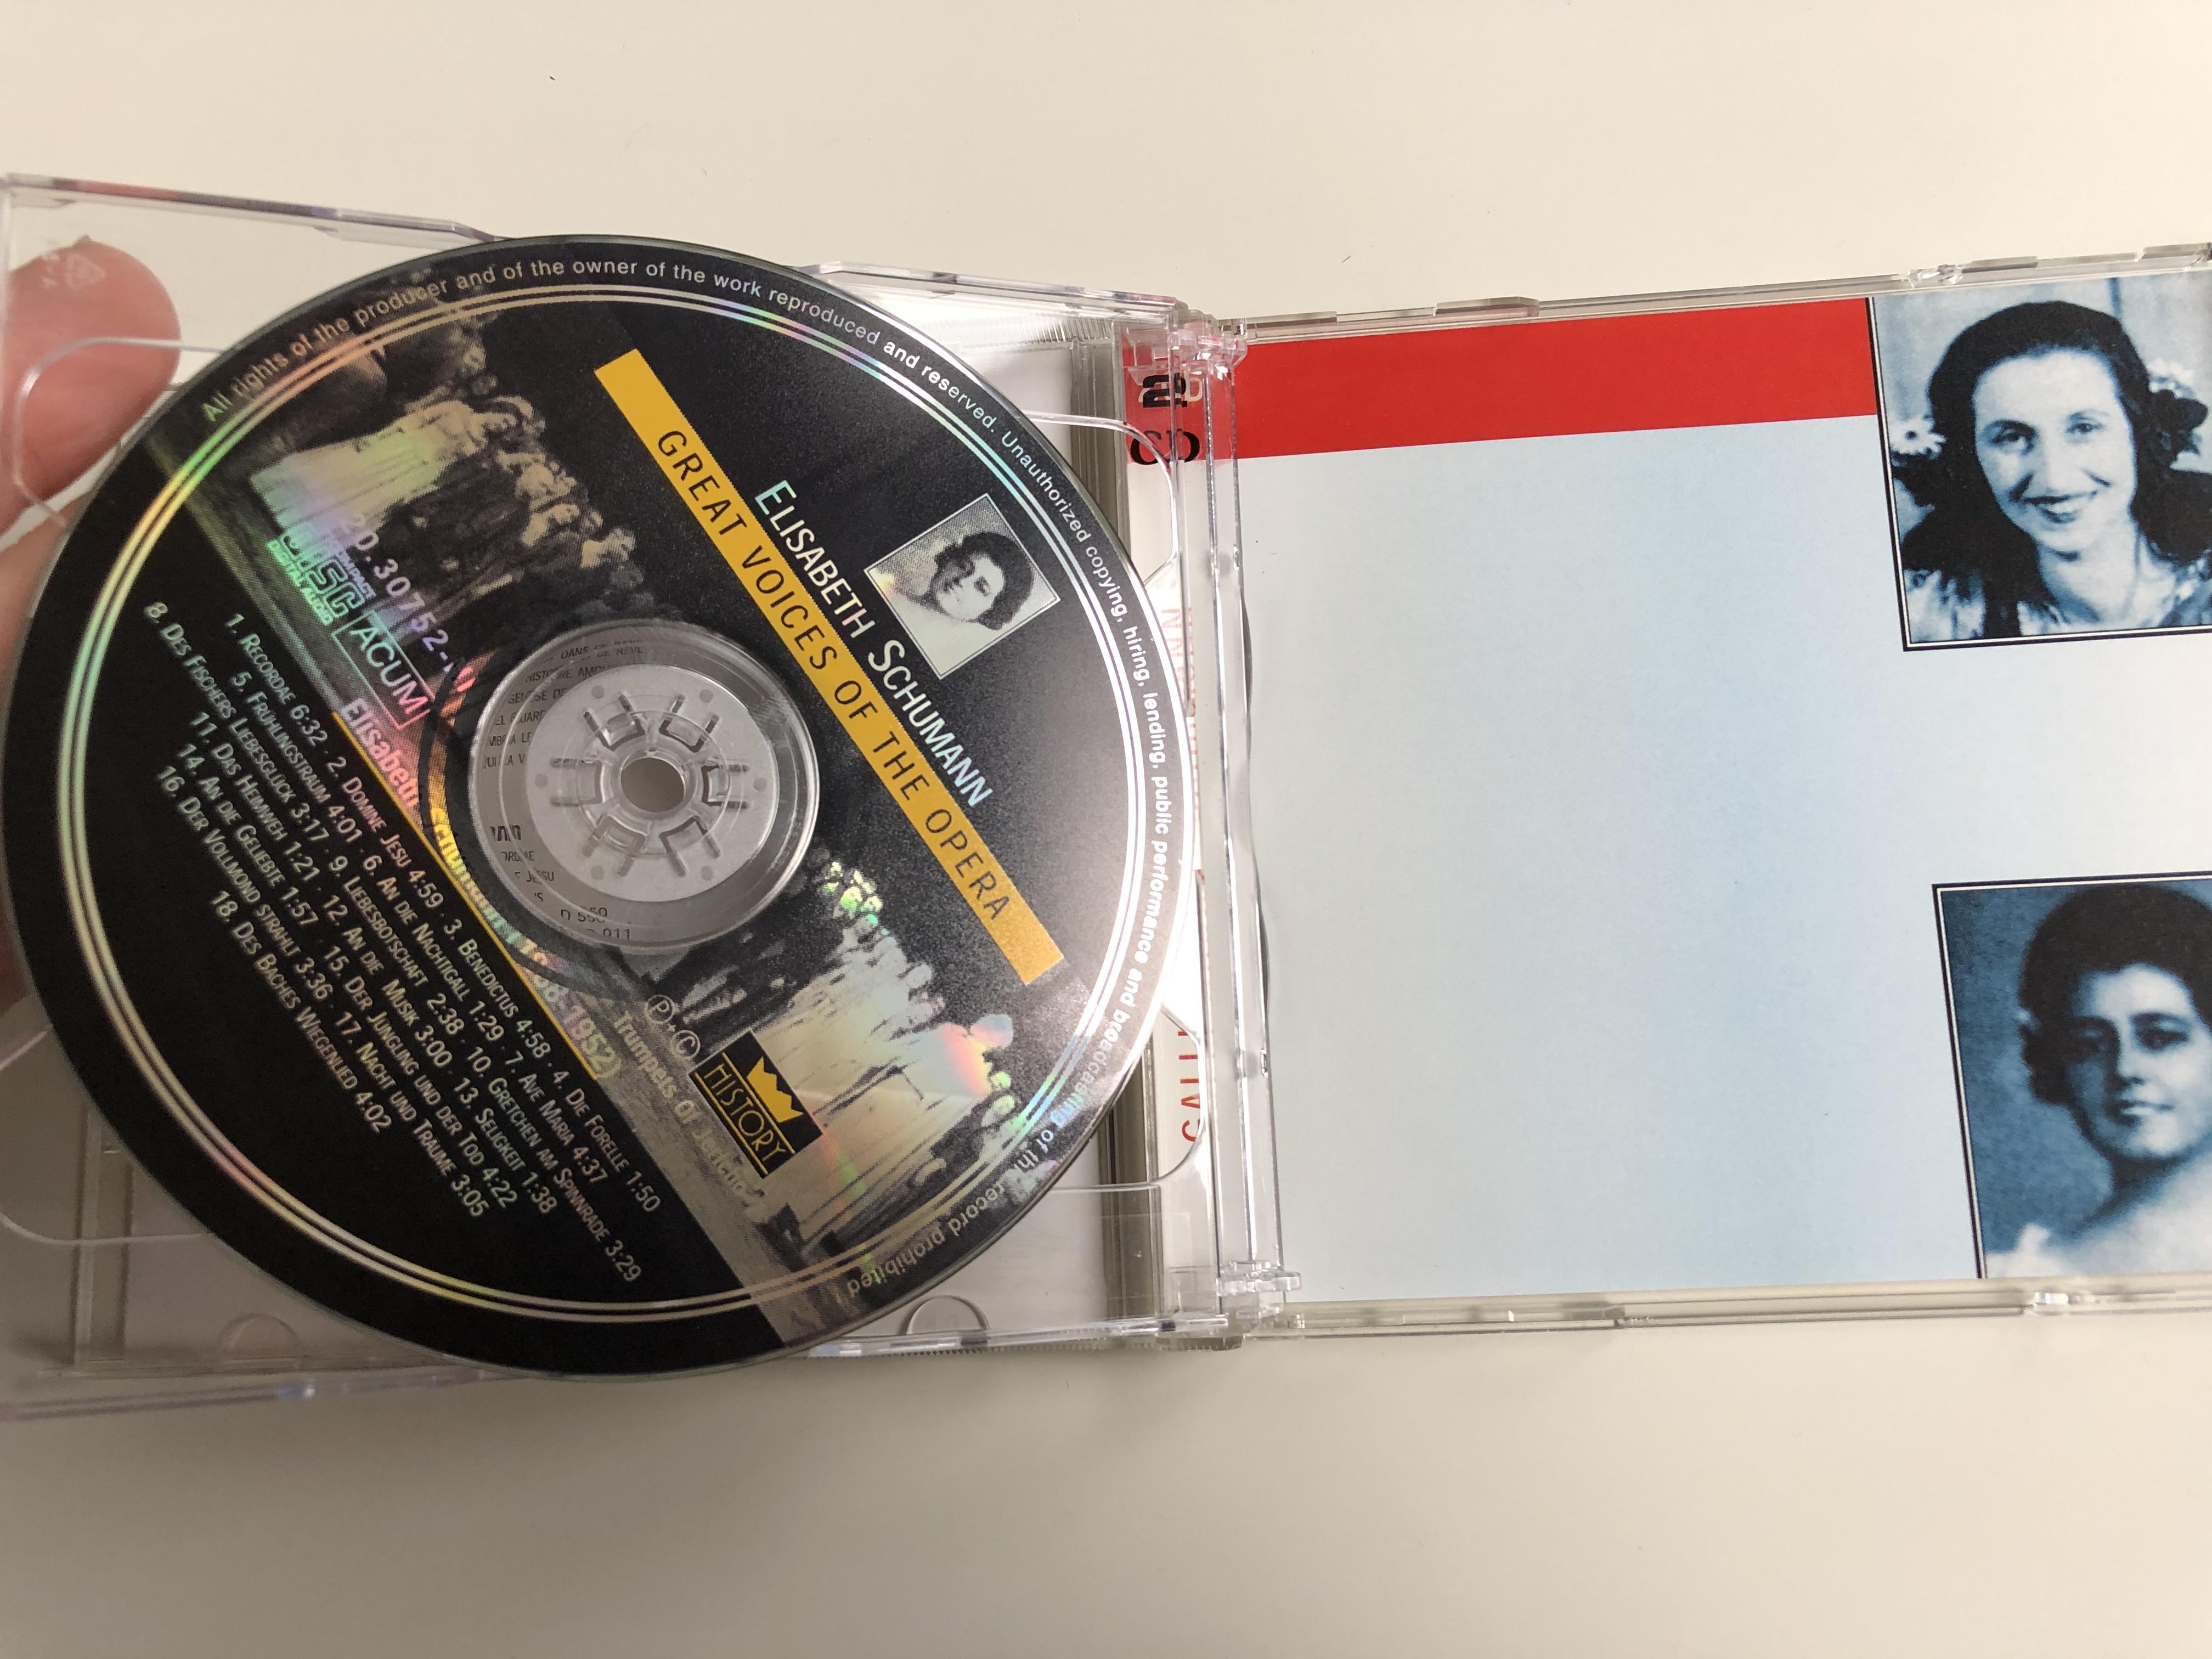 great-voices-of-the-opera-amelita-galli-gurci-elisabeth-schumann-history-2x-audio-cd-20-8-.jpg